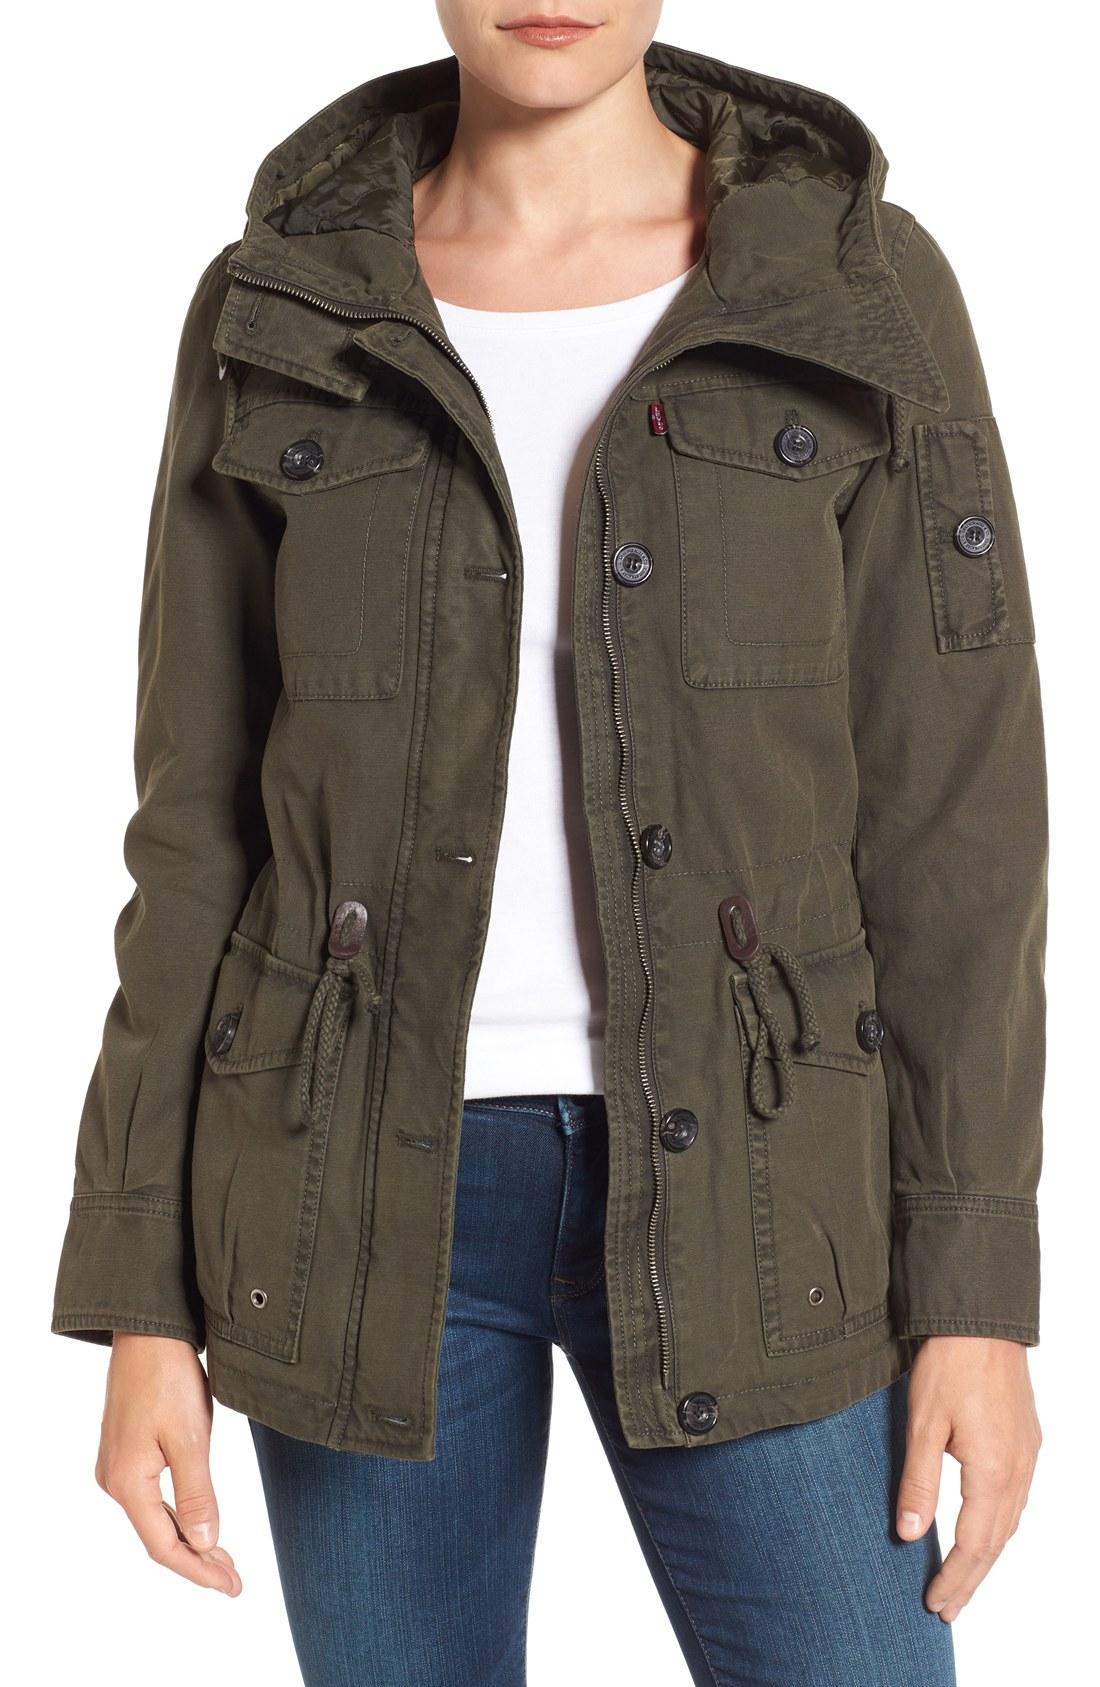 military jackets leviu0027s® cotton twill utility jacket kxxpqyl